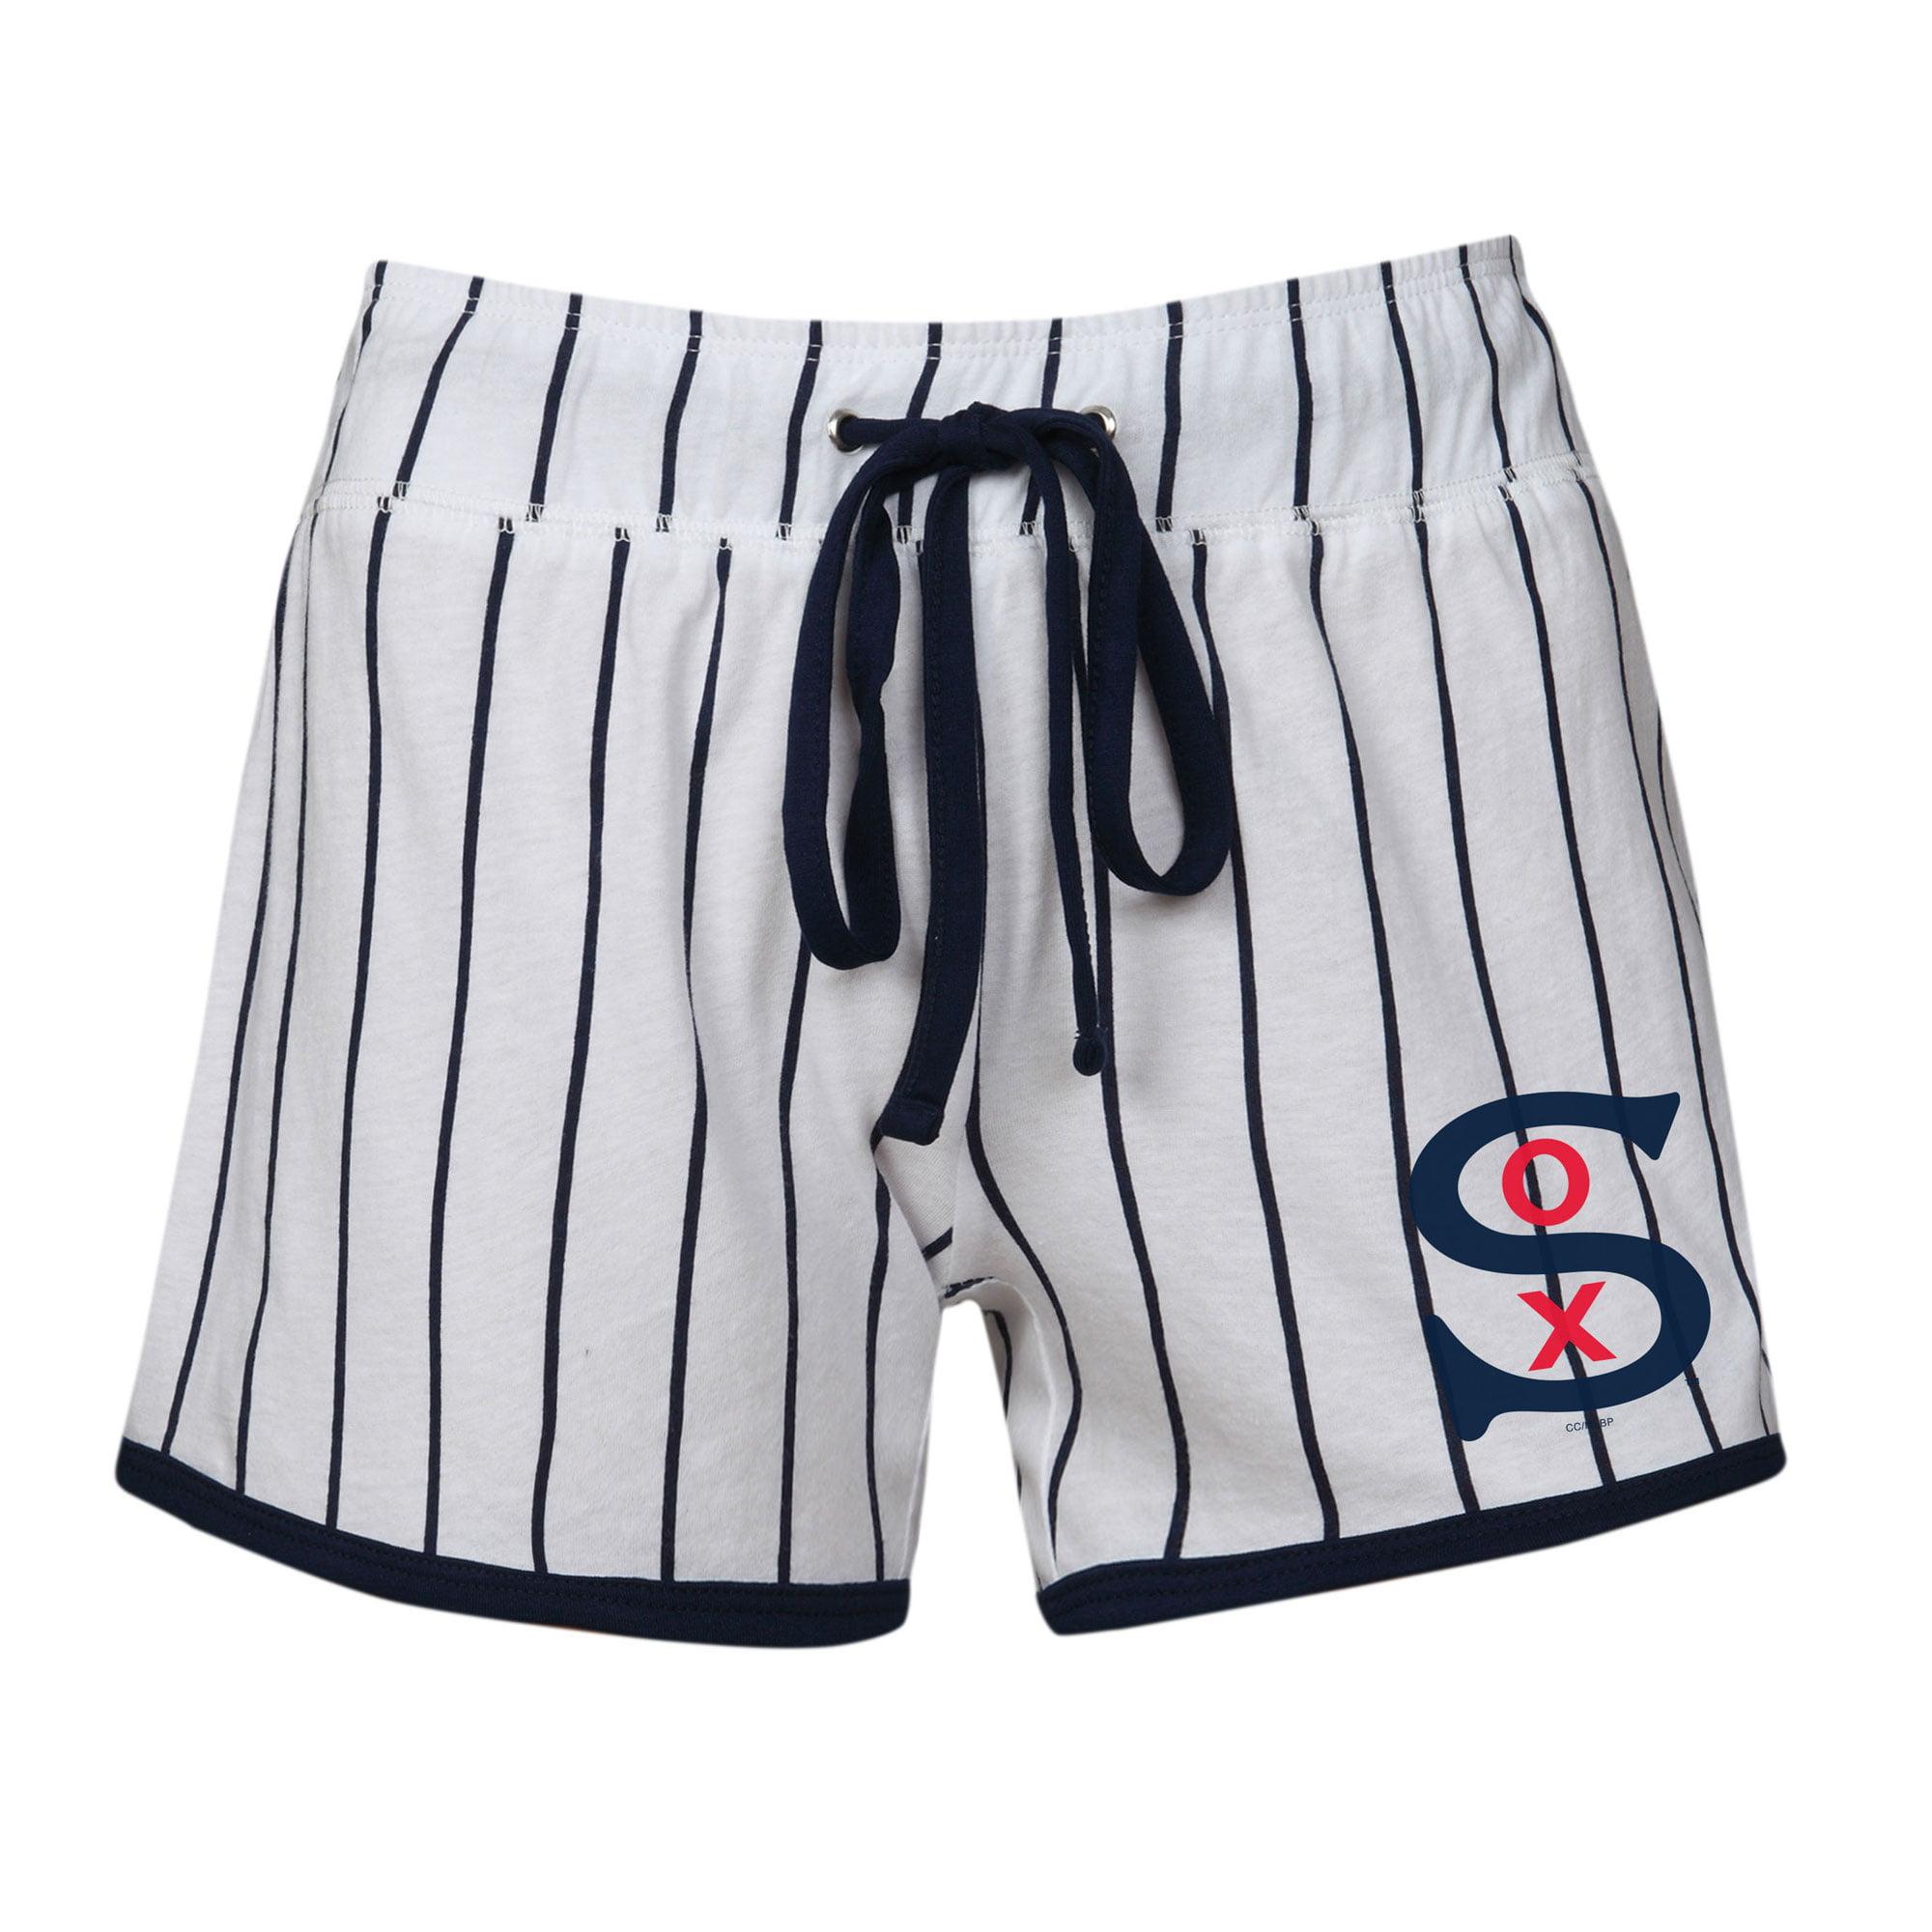 Chicago White Sox Concepts Sport Women's Vigor Sleep Shorts - White/Navy